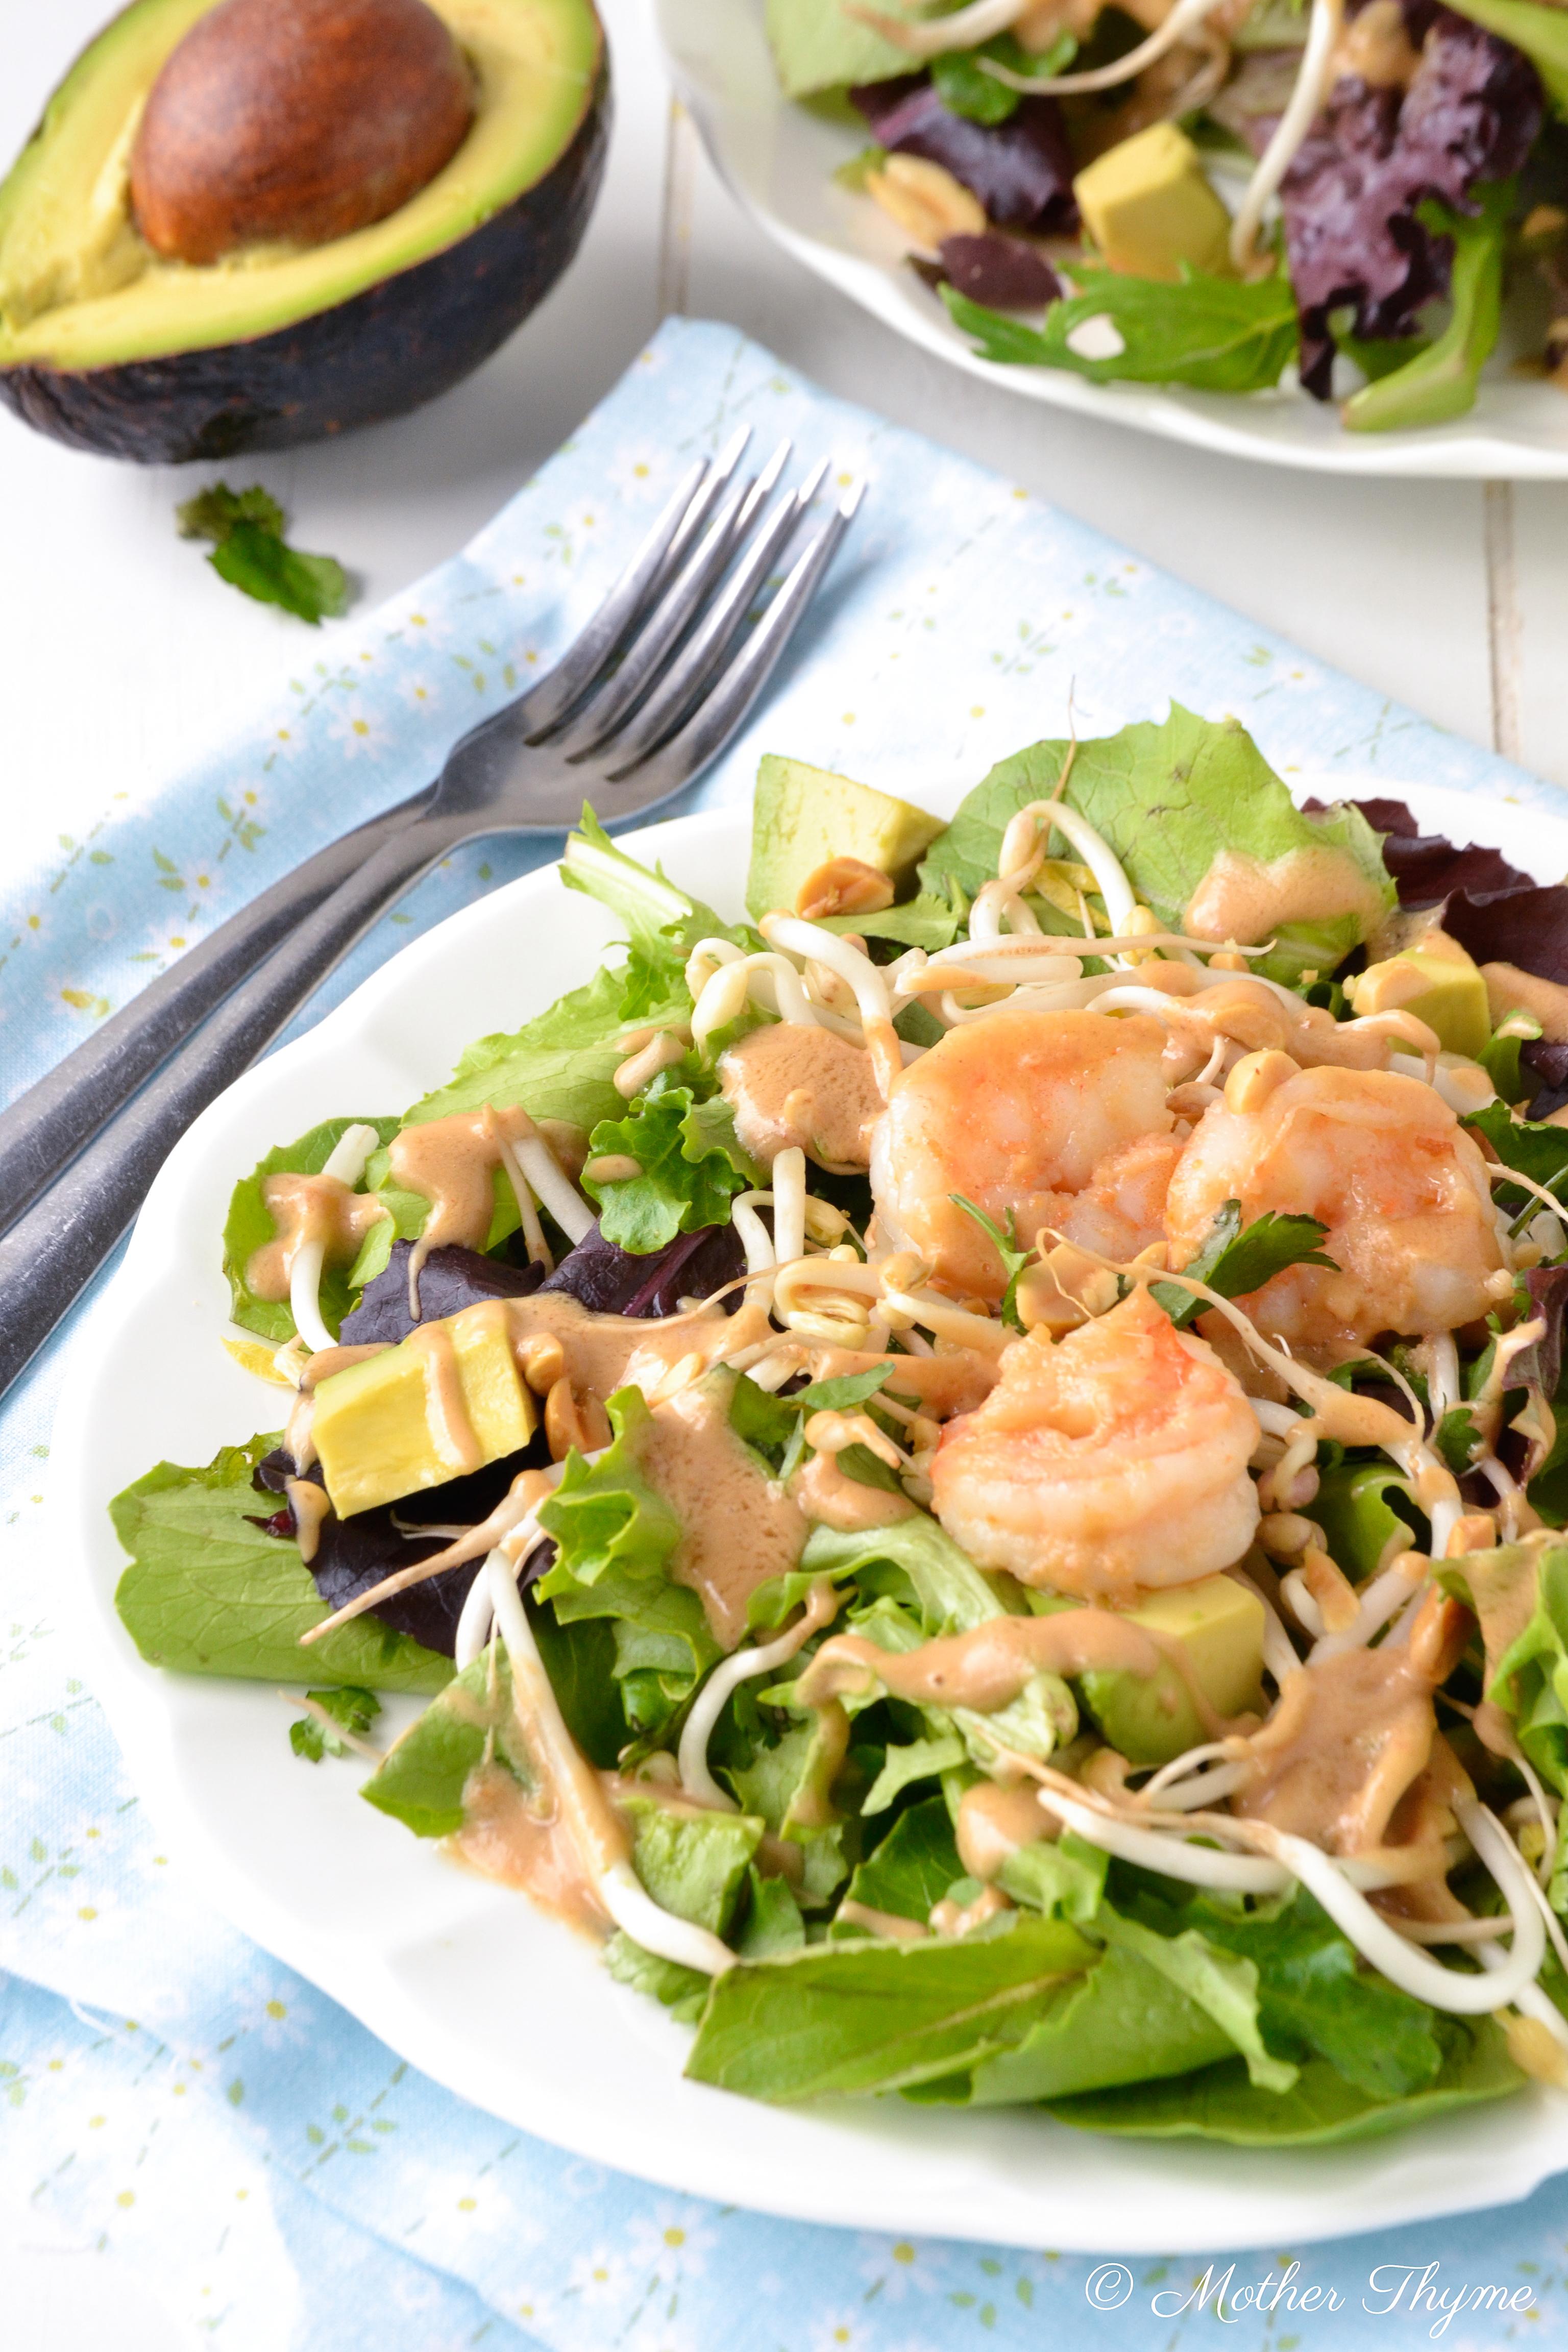 Thai Shrimp Salad with Peanut Dressing | Mother Thyme